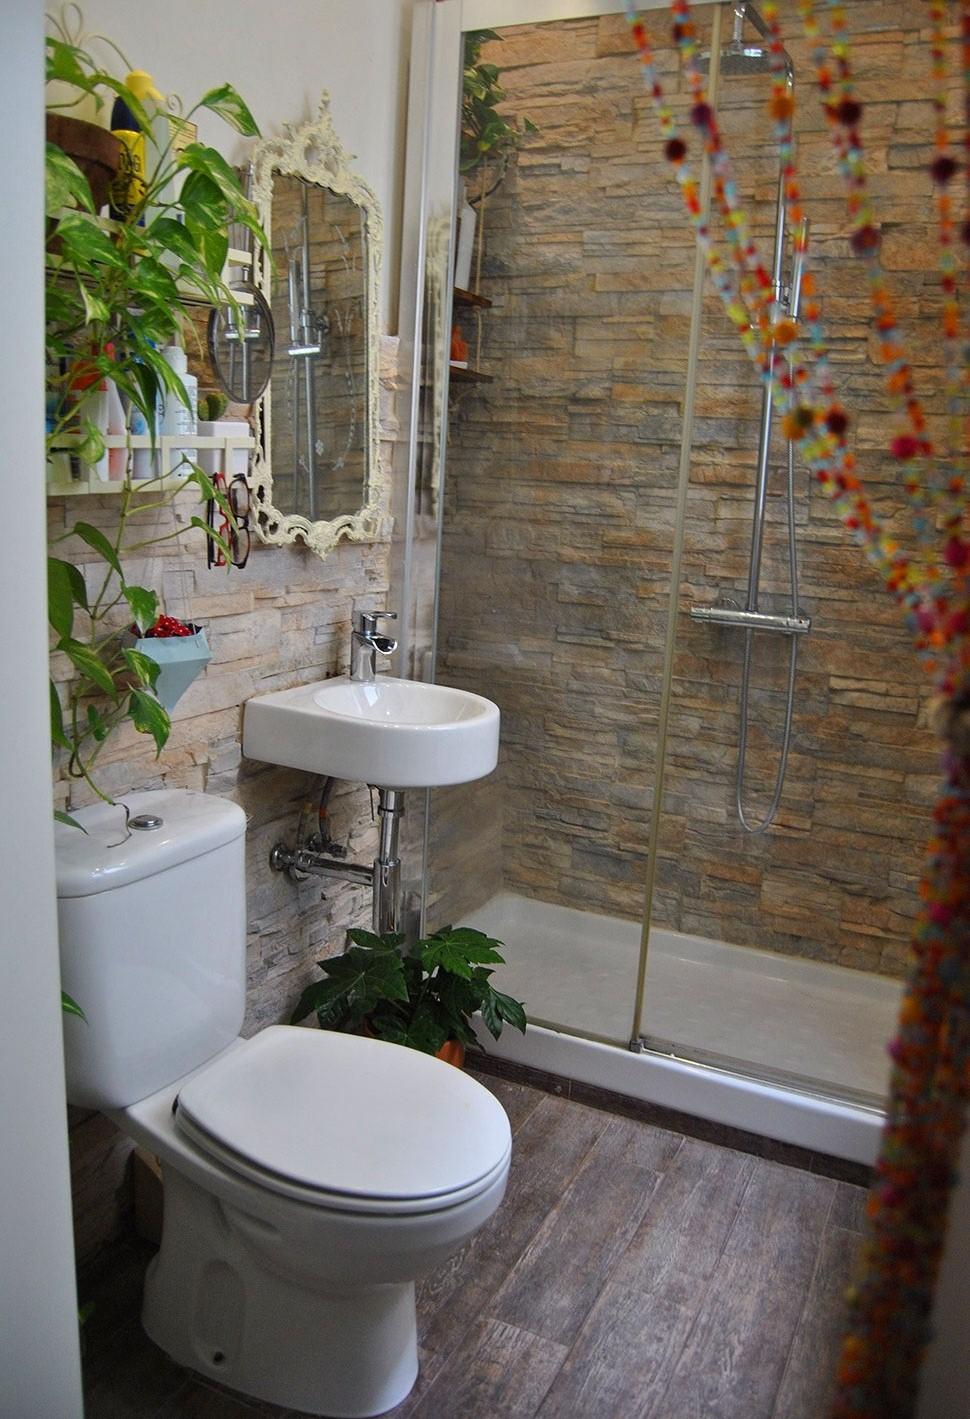 Estanterias para la ducha top euroshowers estantera - Estanteria encima wc ...